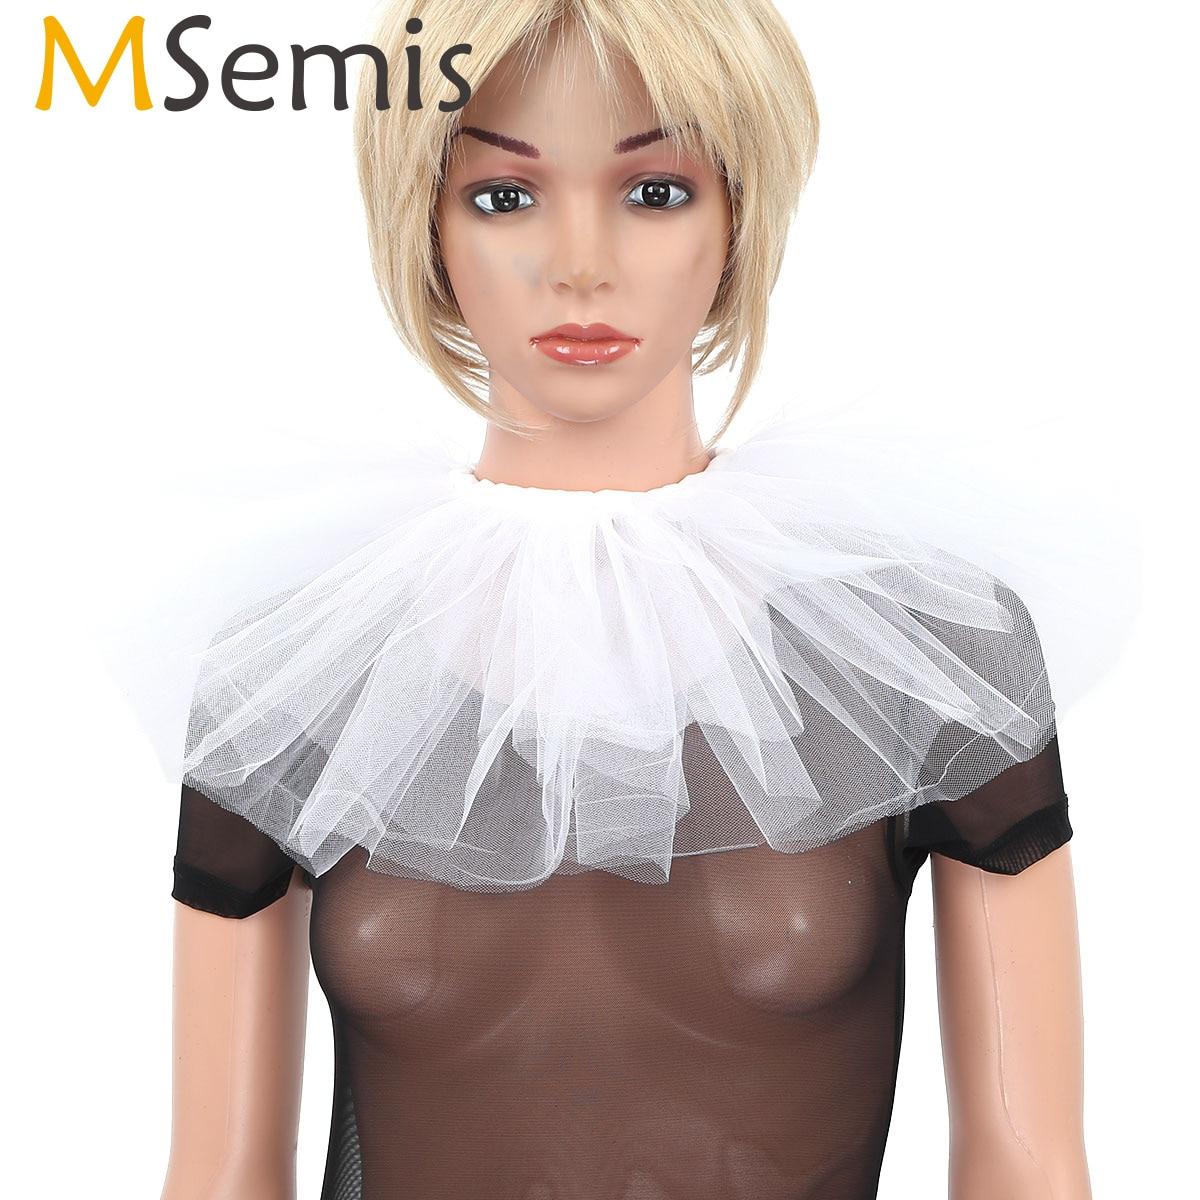 MSemis Womens Vintage Retro Ruffled Neck Collar Clown Mesh Choker Detachable Fake Collar Stage Performance Props Accessories